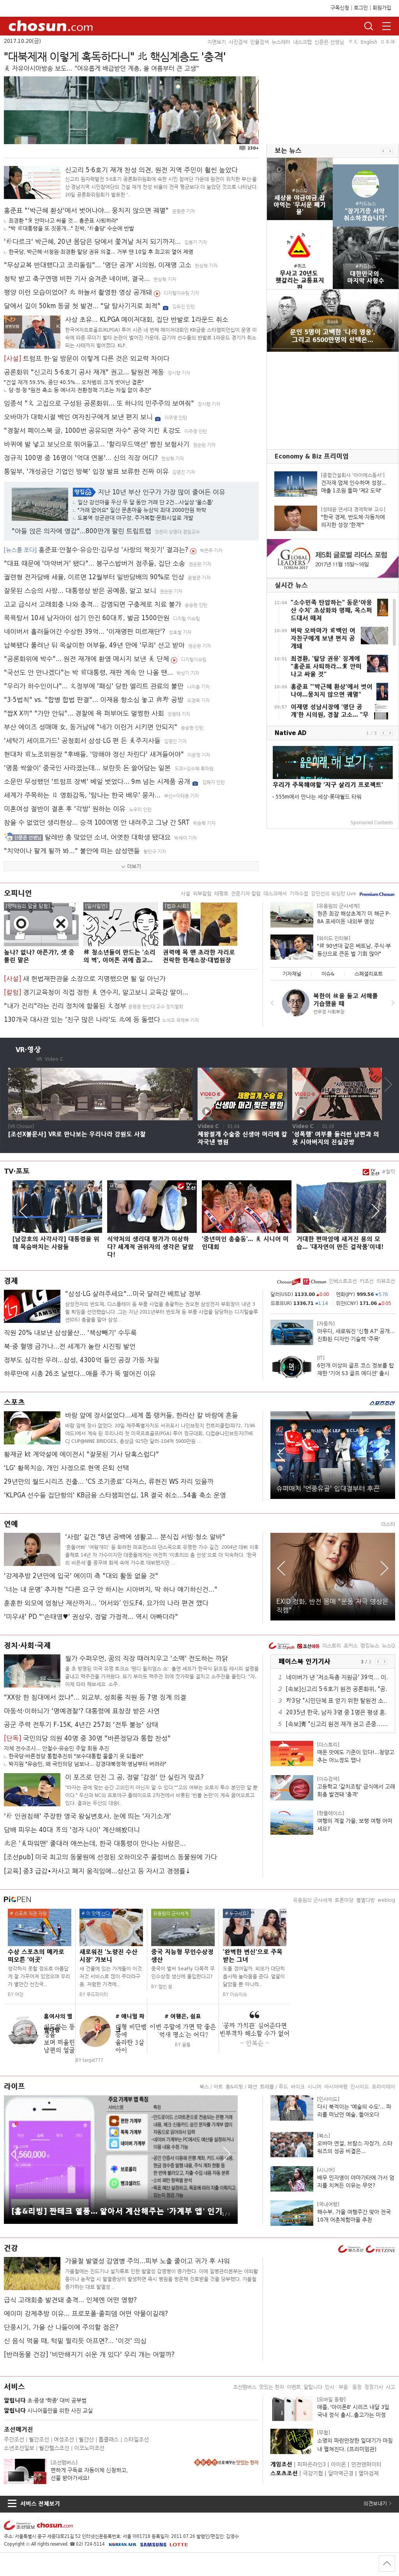 chosun.com at Friday Oct. 20, 2017, 1:01 p.m. UTC